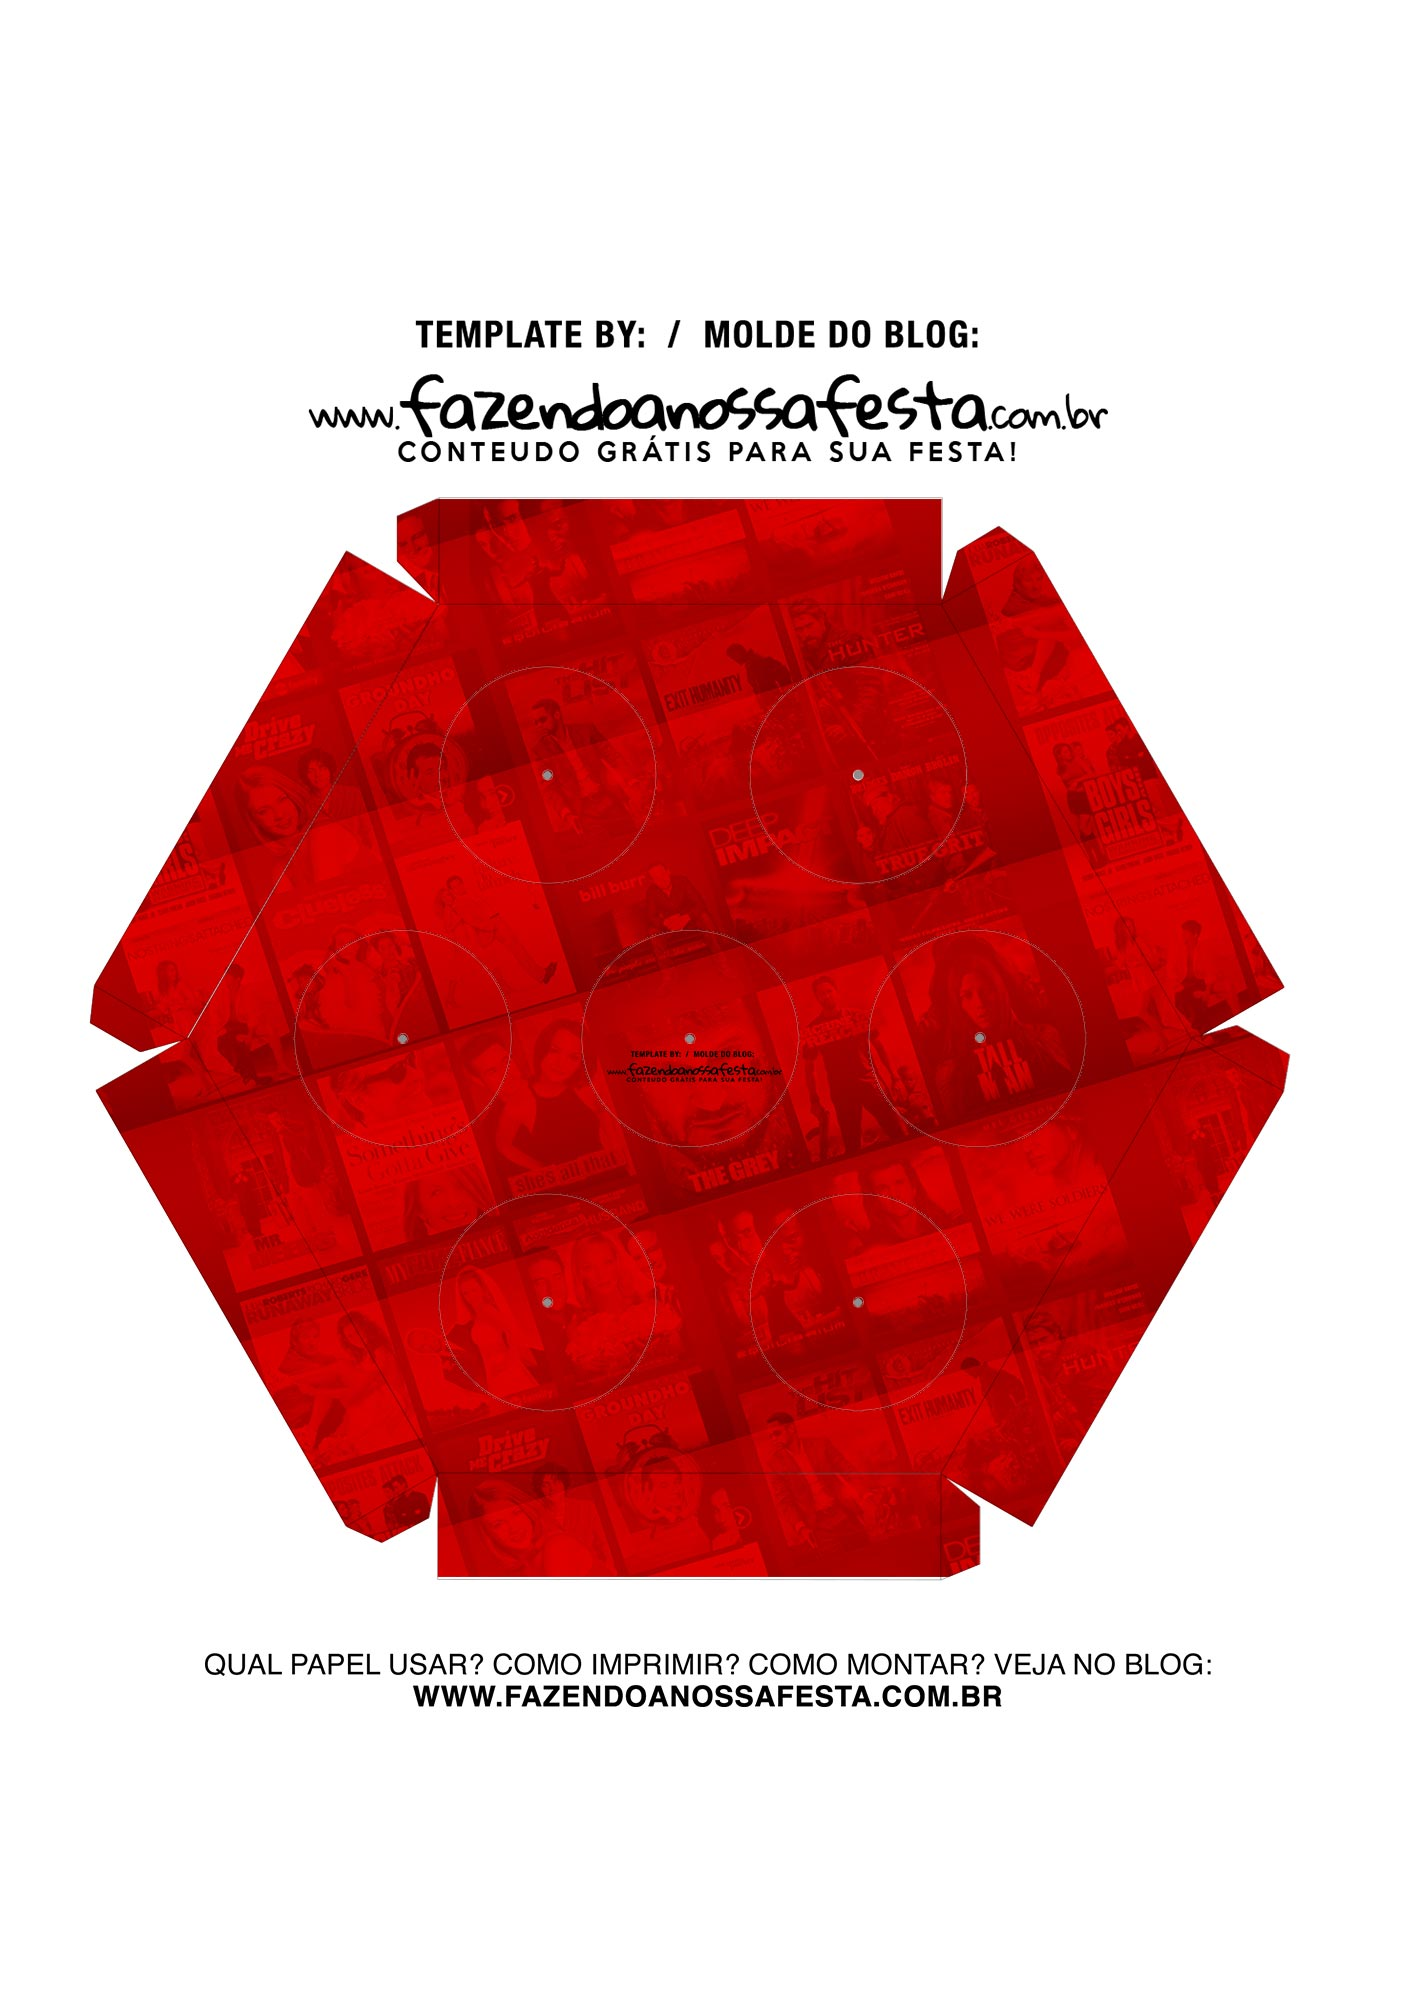 Caixa Explosiva Dia dos Namorados Netflix 6